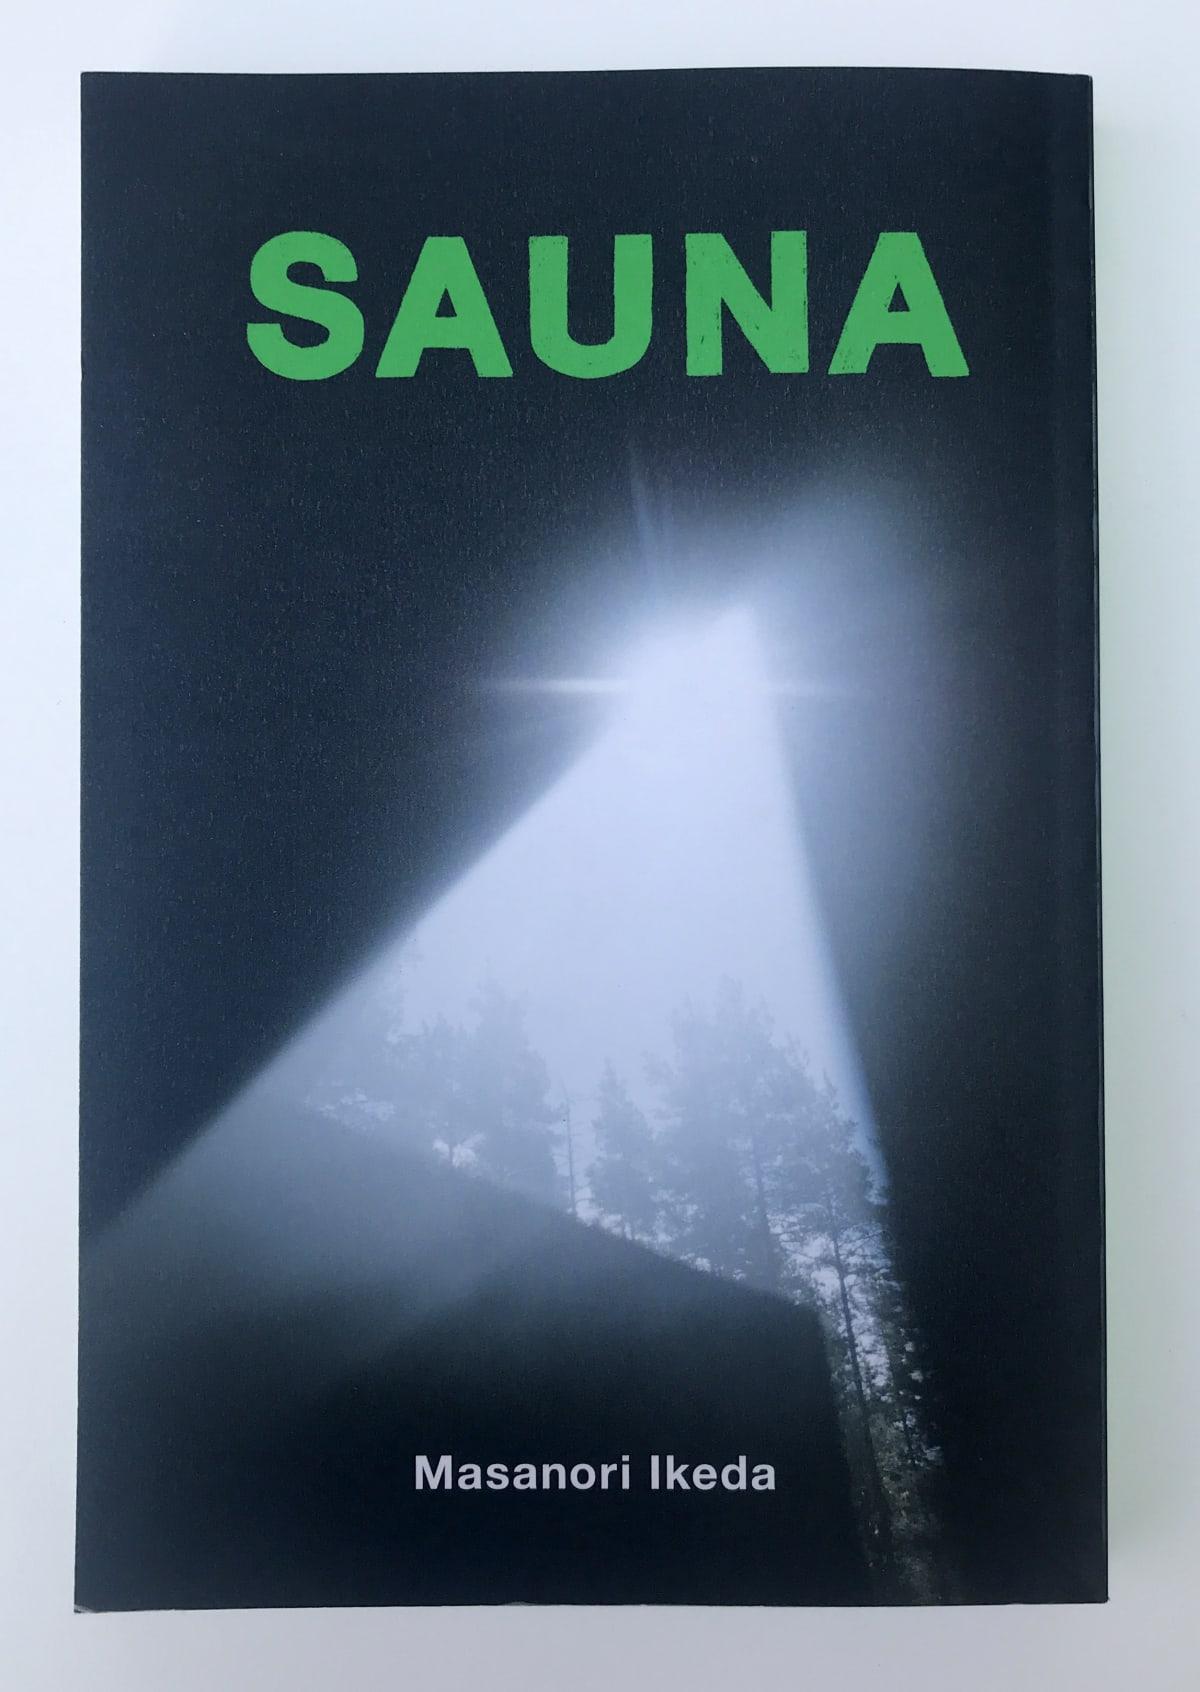 SAUNA - Masanori Ikeda